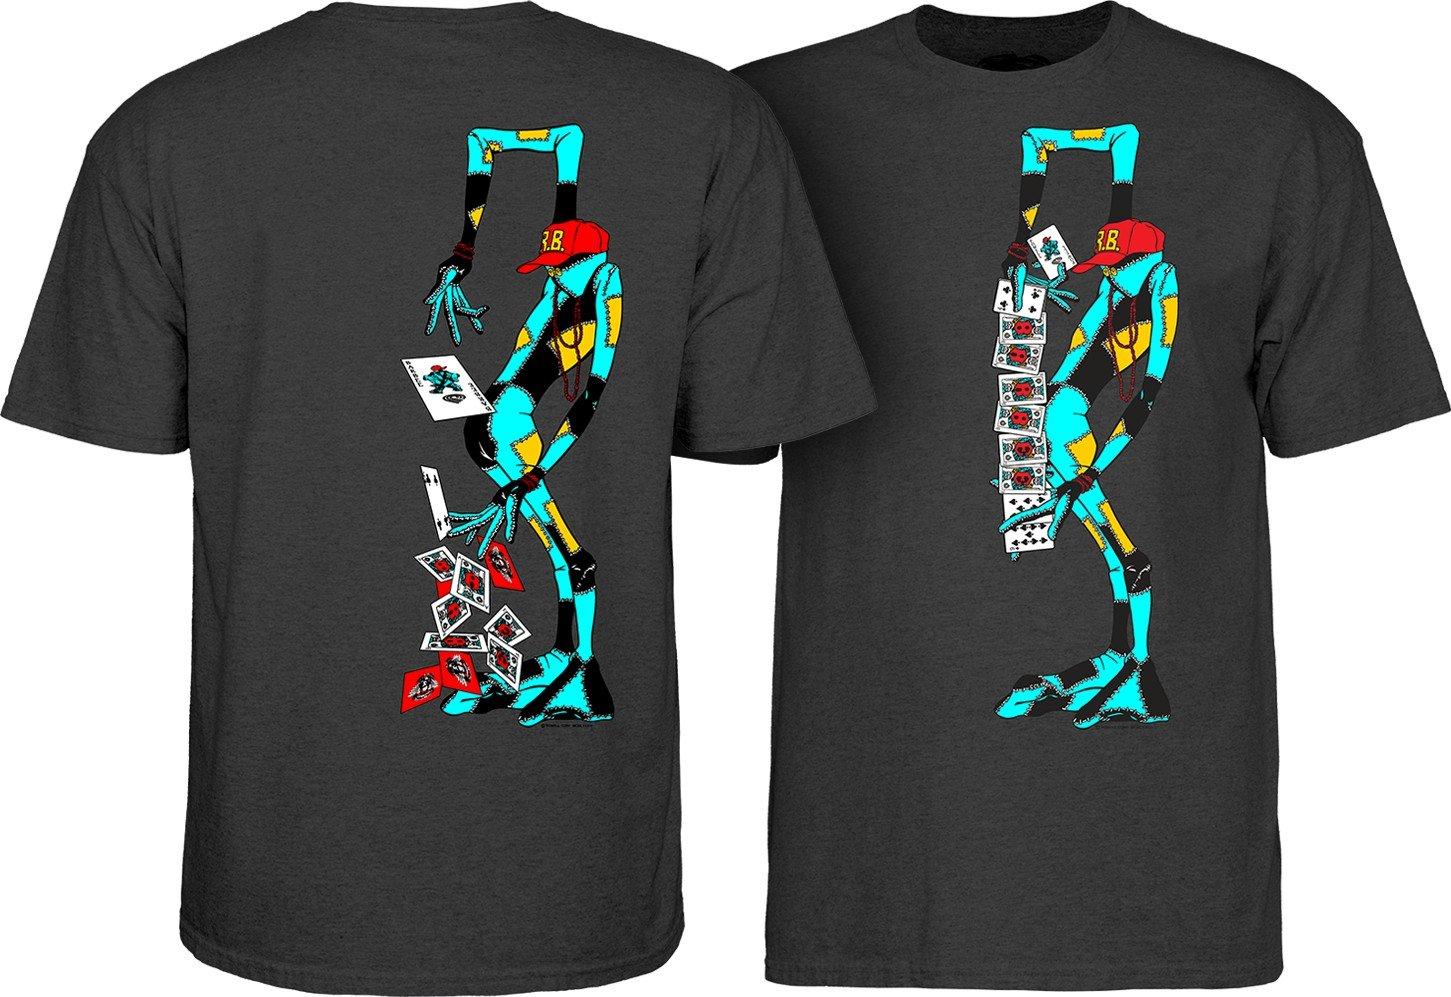 Powell Peralta Ray Barbee Ragdoll T-shirt Charcoal